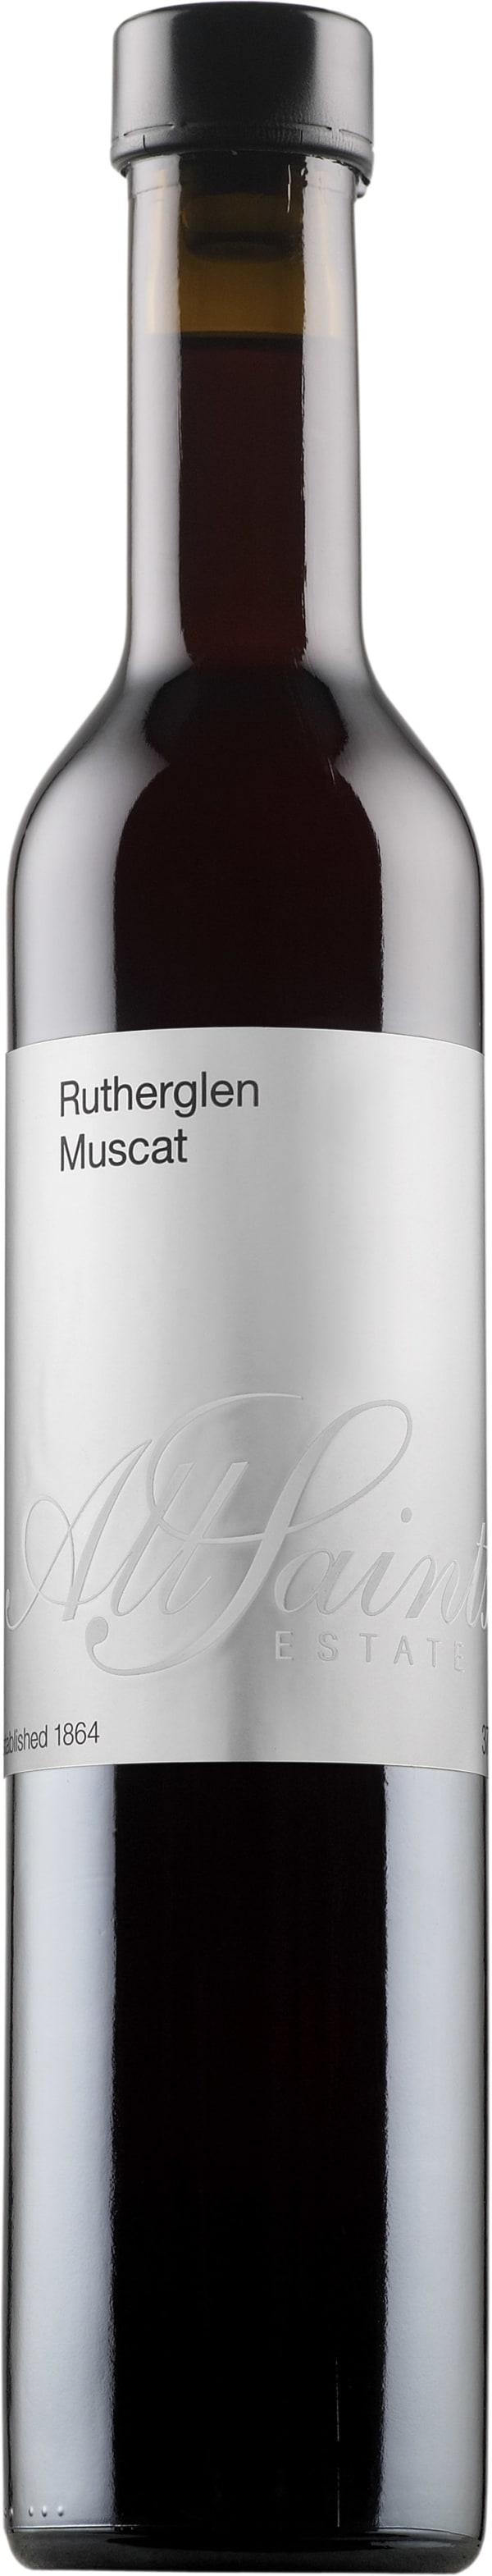 All Saints Rutherglen Muscat